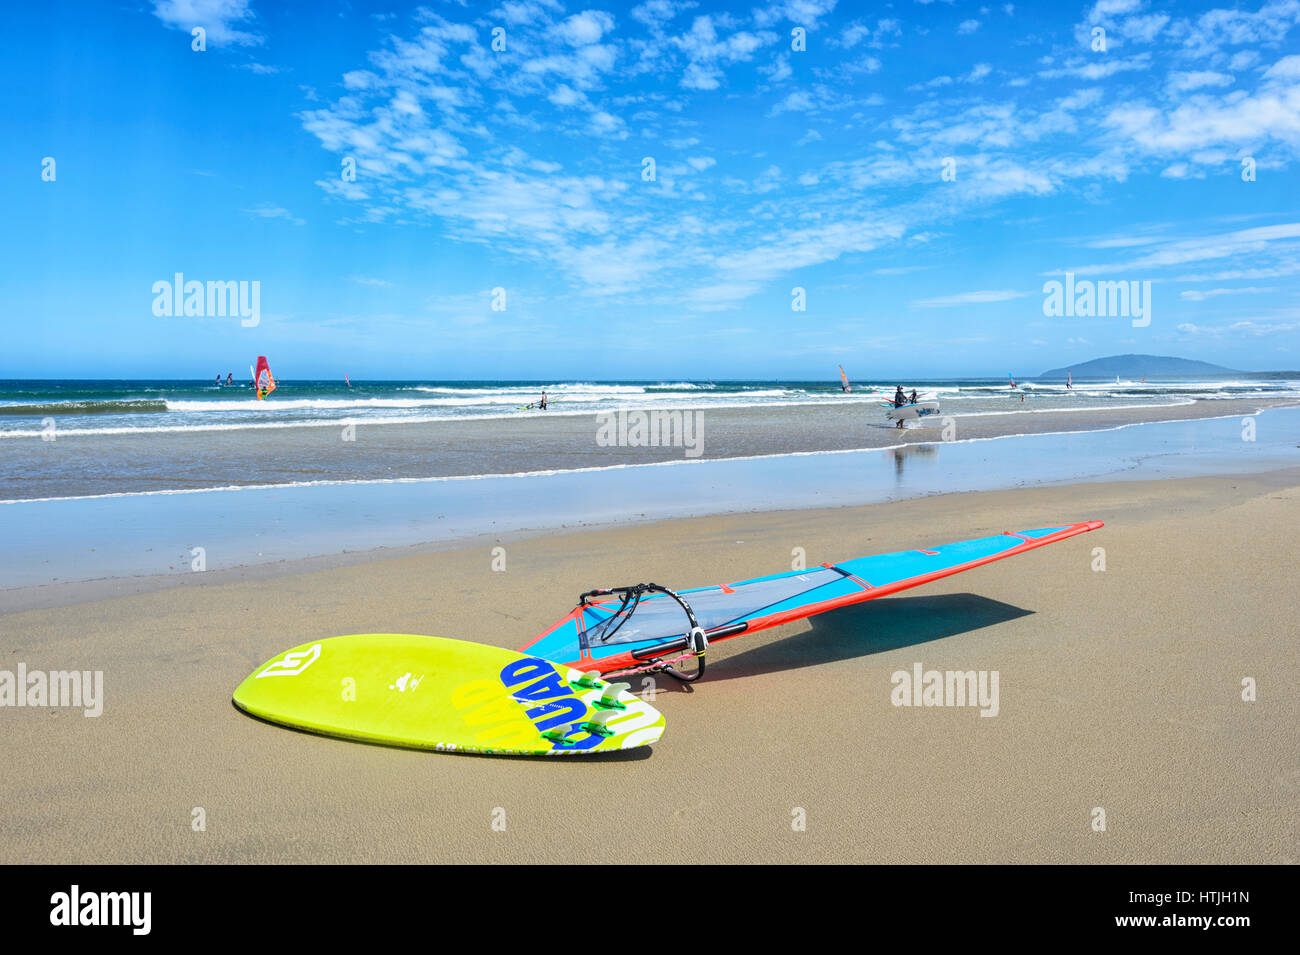 Yellow windsurfing board on Seven Mile Beach, Gerroa, Illawarra Coast, New South Wales, NSW, Australia - Stock Image